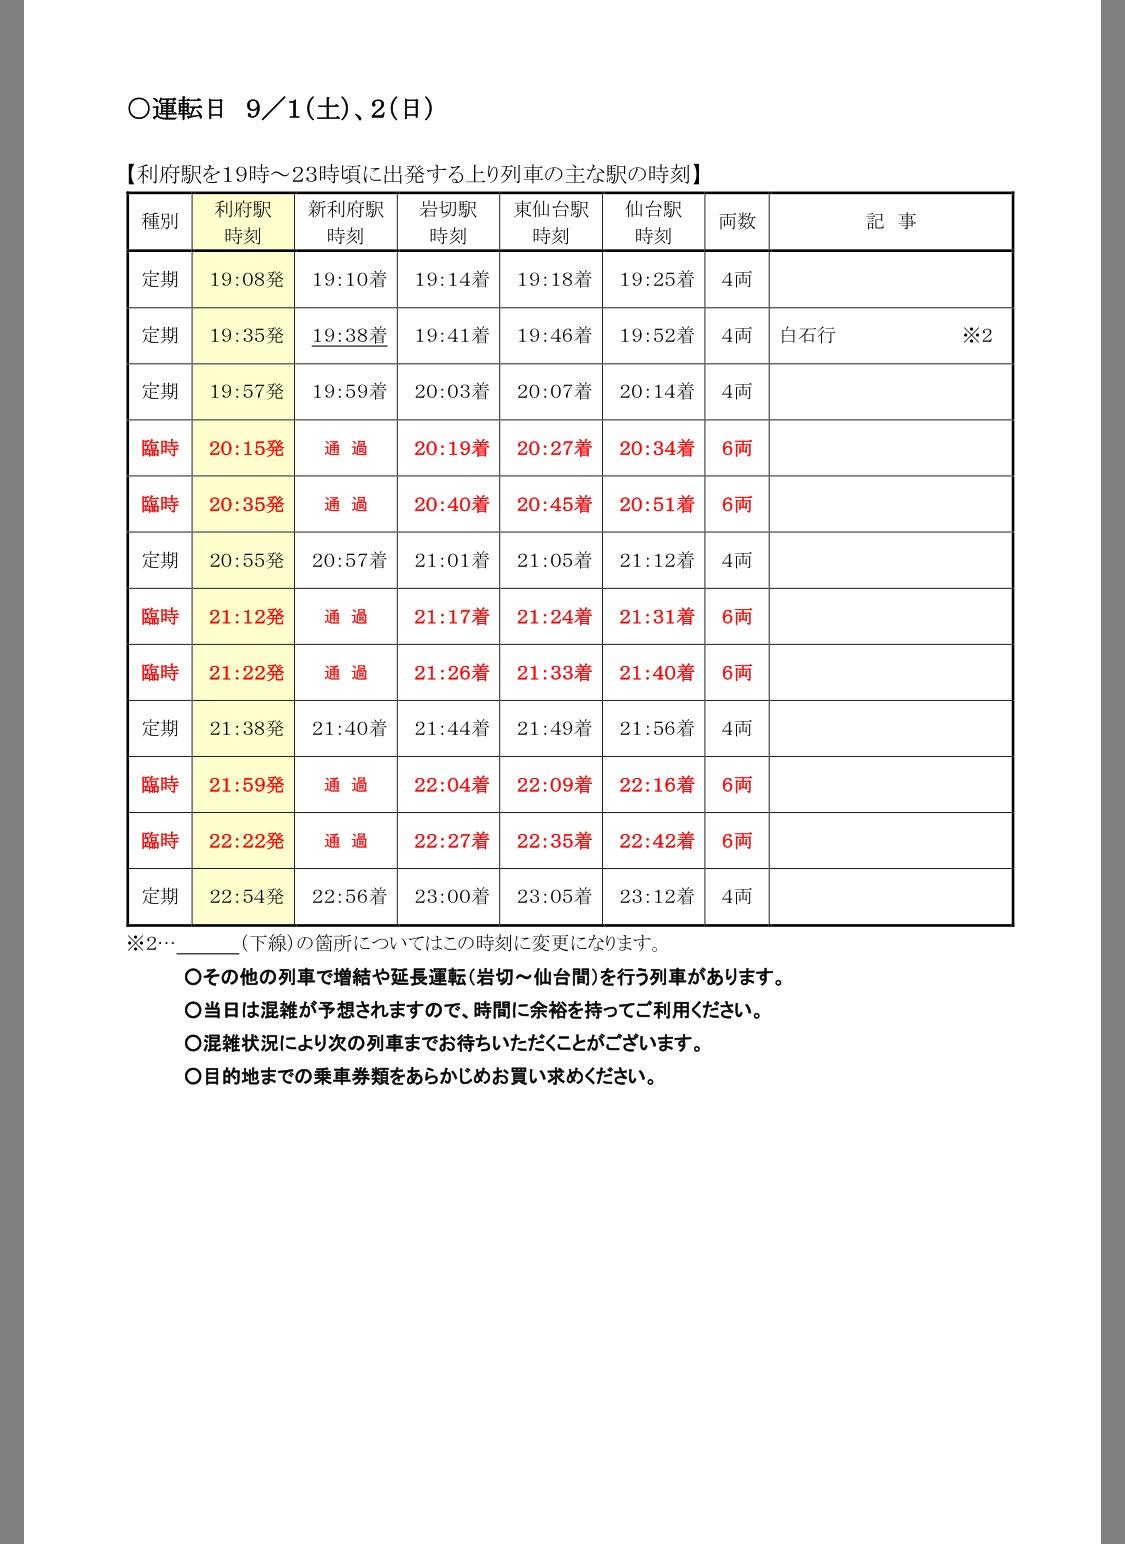 JR東日本、乃木坂46全ツ2018宮城の開催にあわせて仙台~利府駅で臨時列車運転2